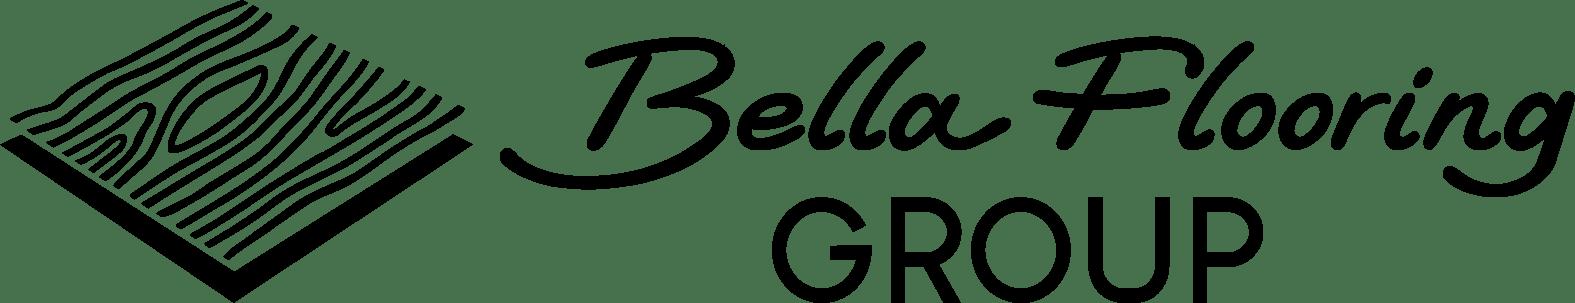 Bella Flooring Group logo